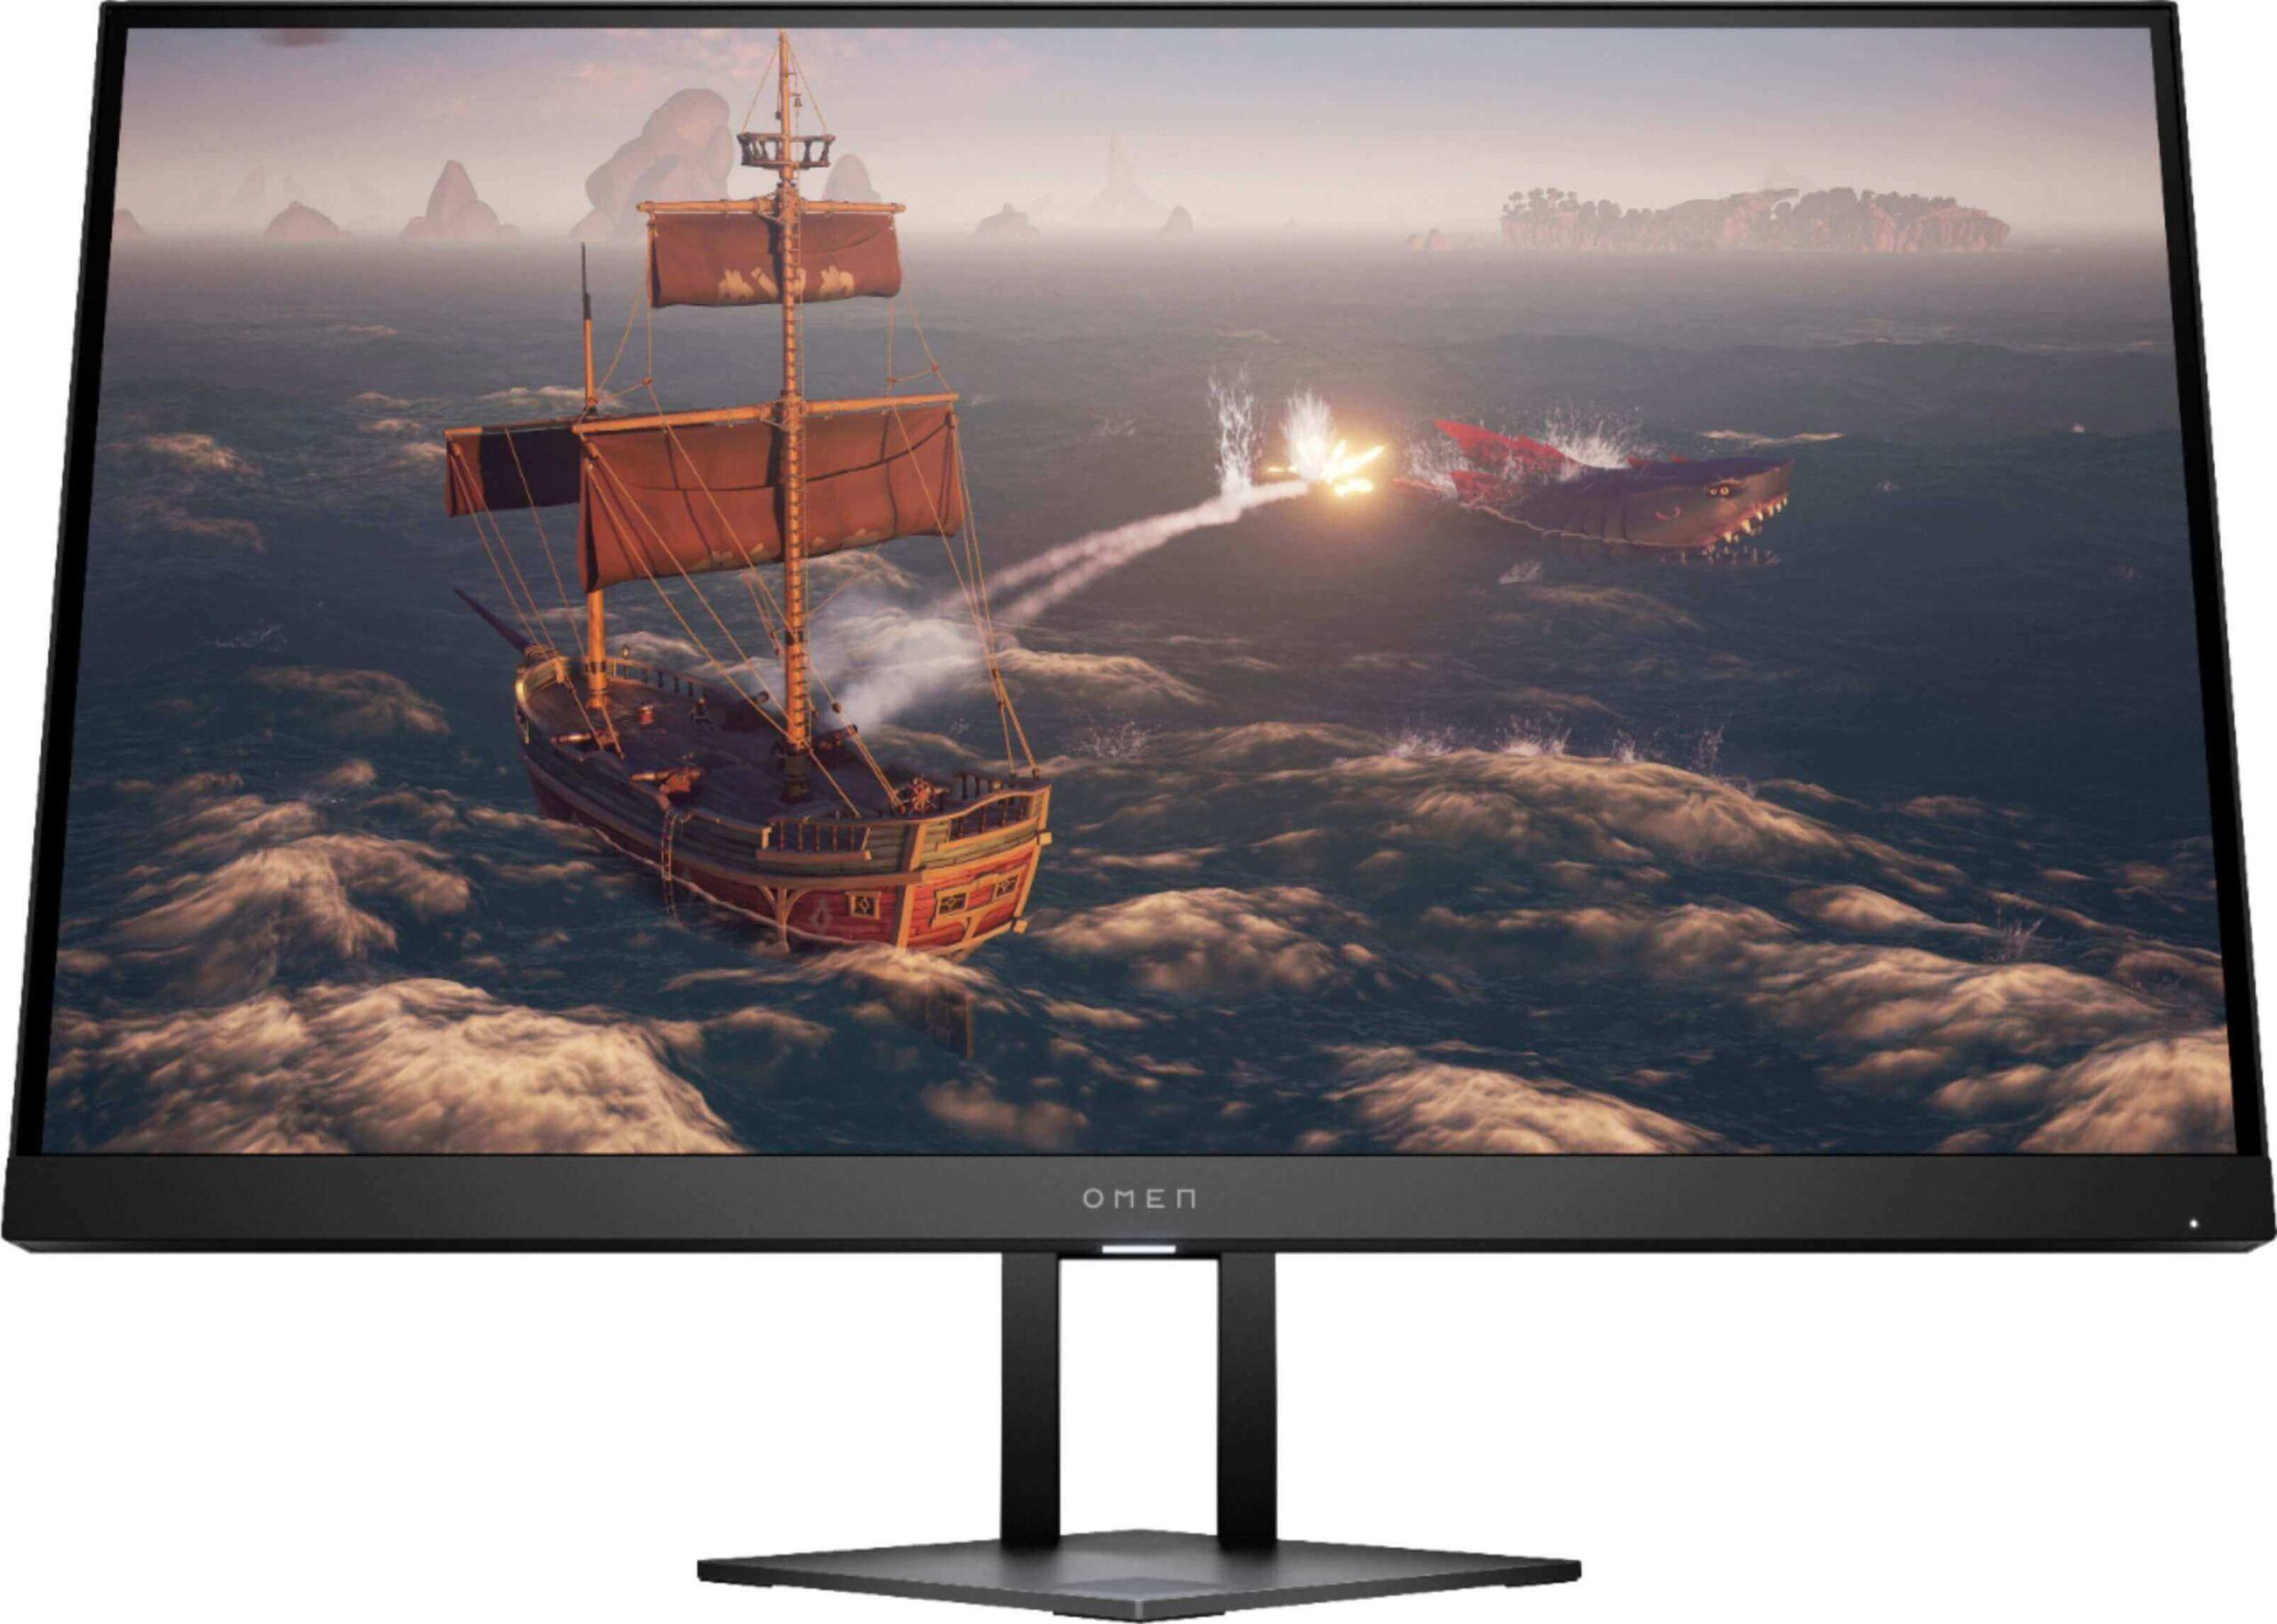 ViewSonic VP2458 Professional 24-inch monitor